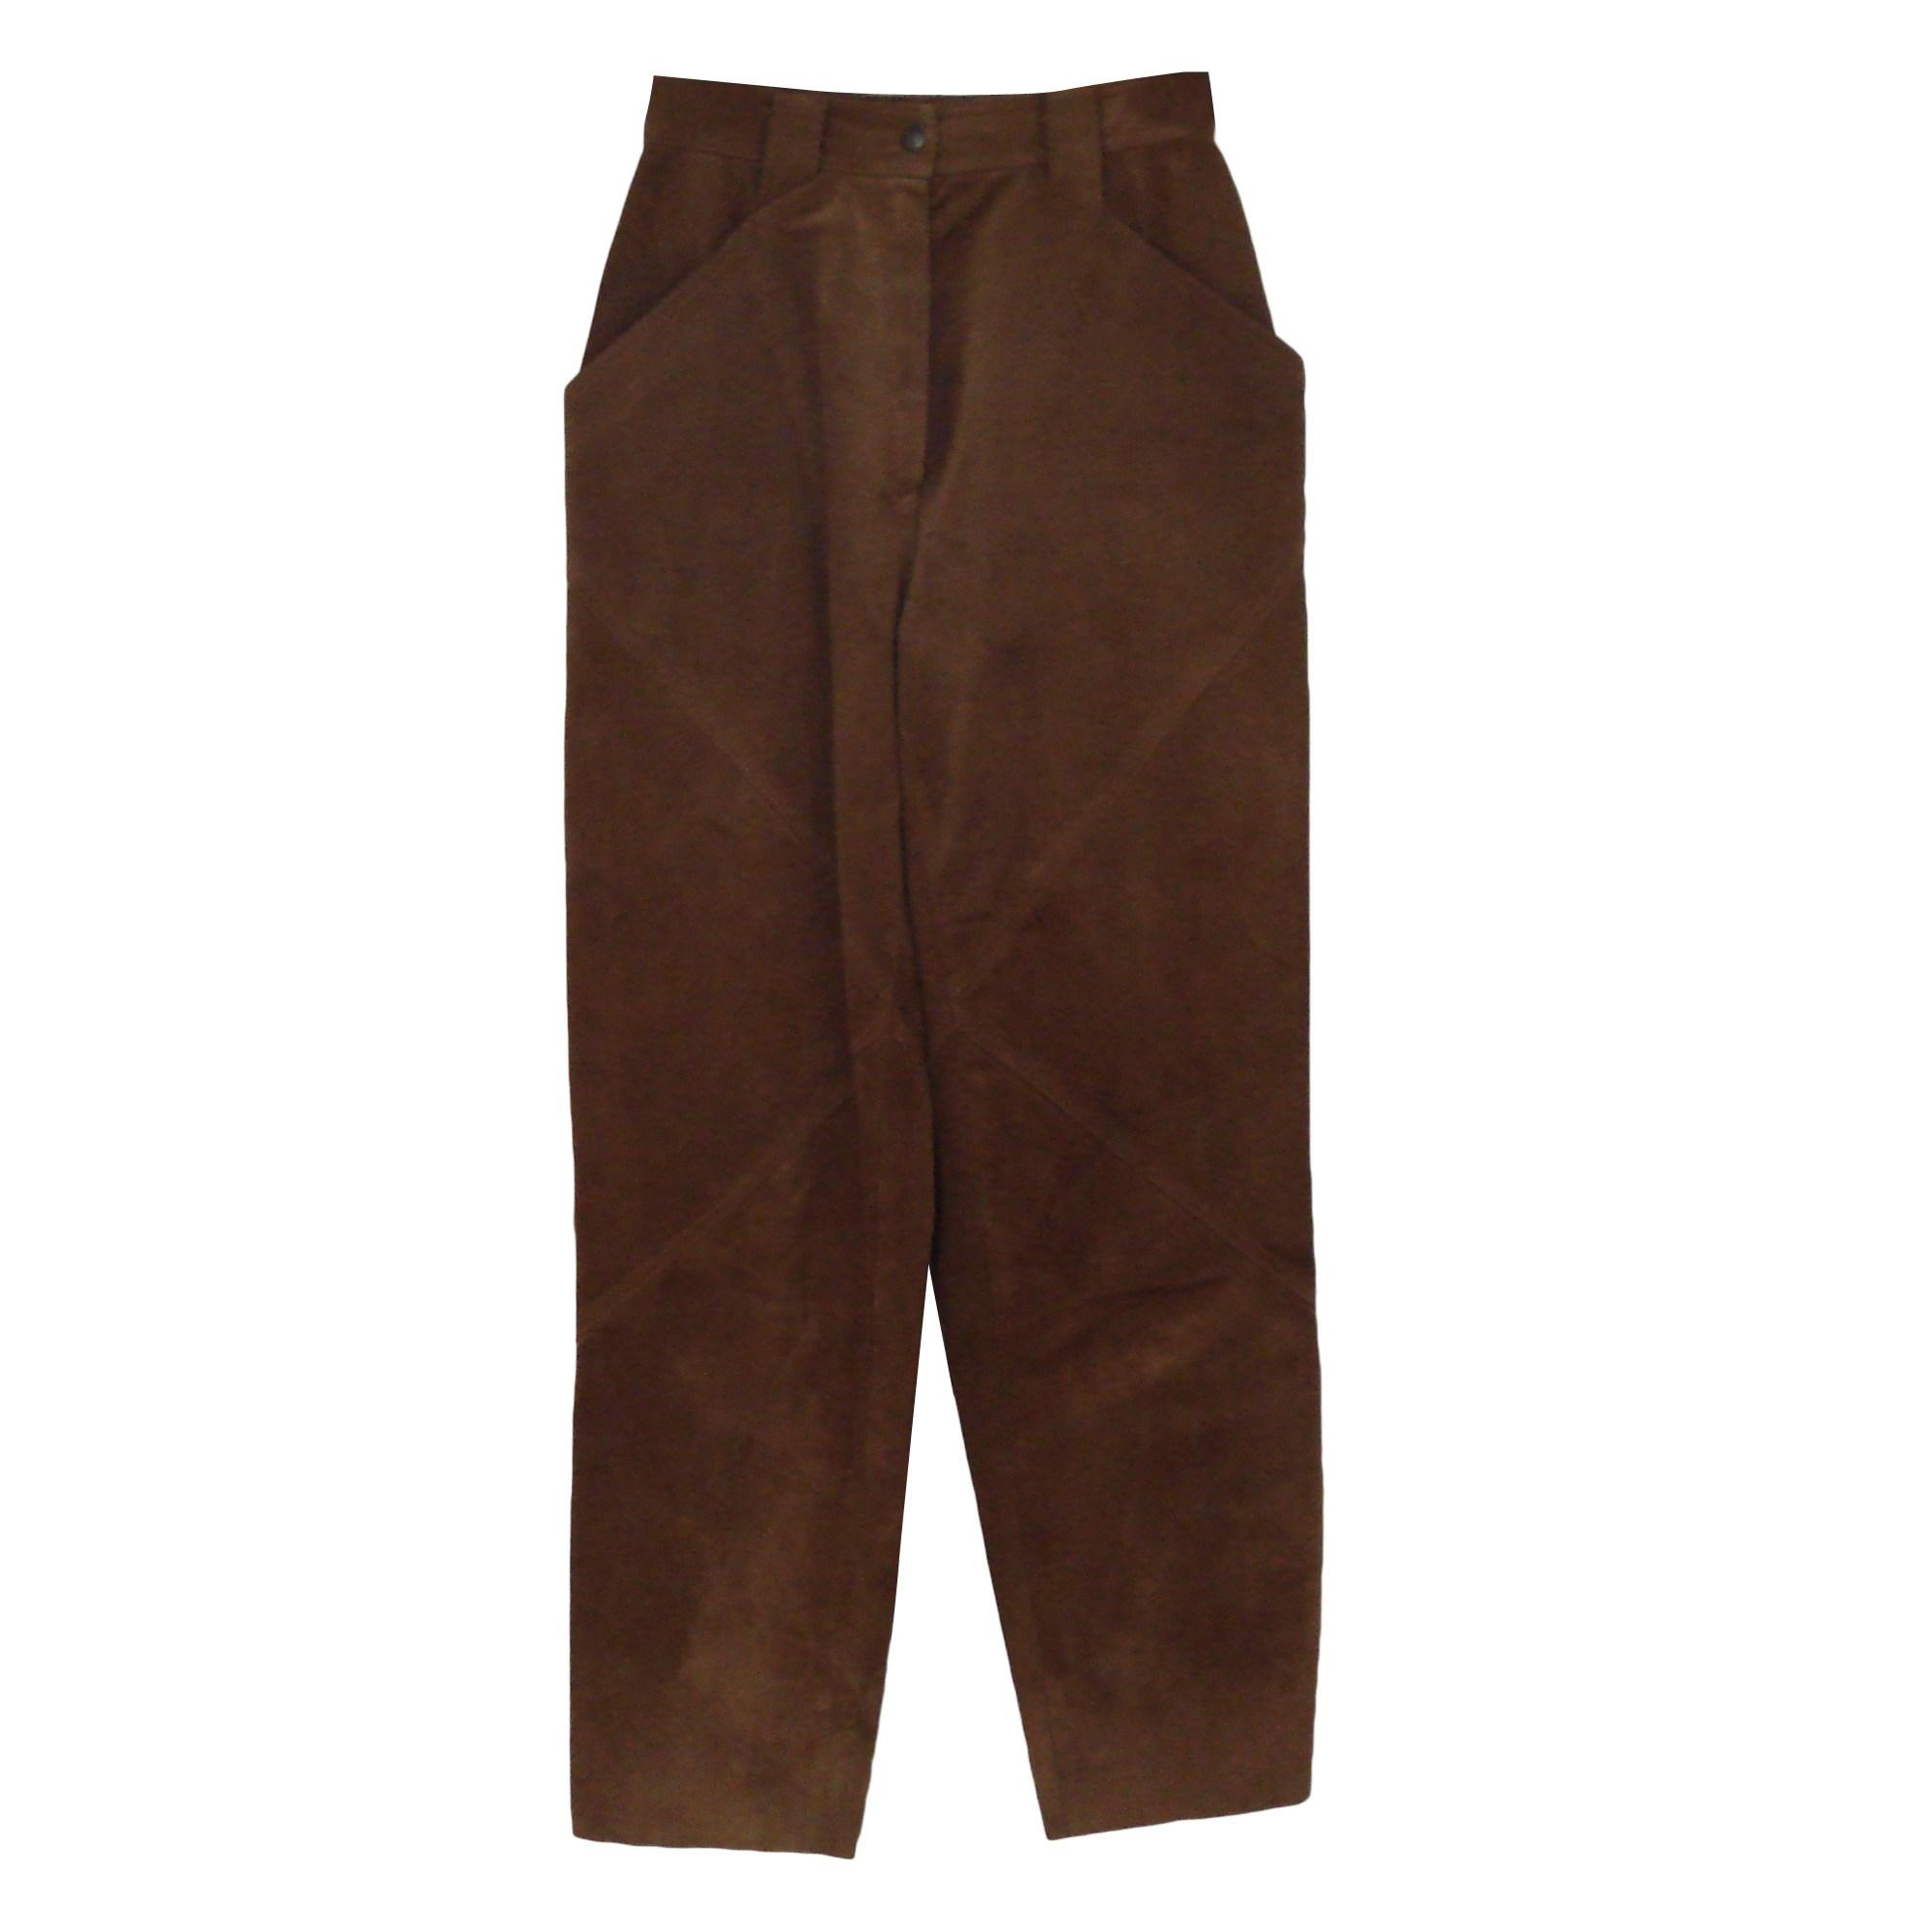 Pantalon carotte MAC DOUGLAS Beige, camel